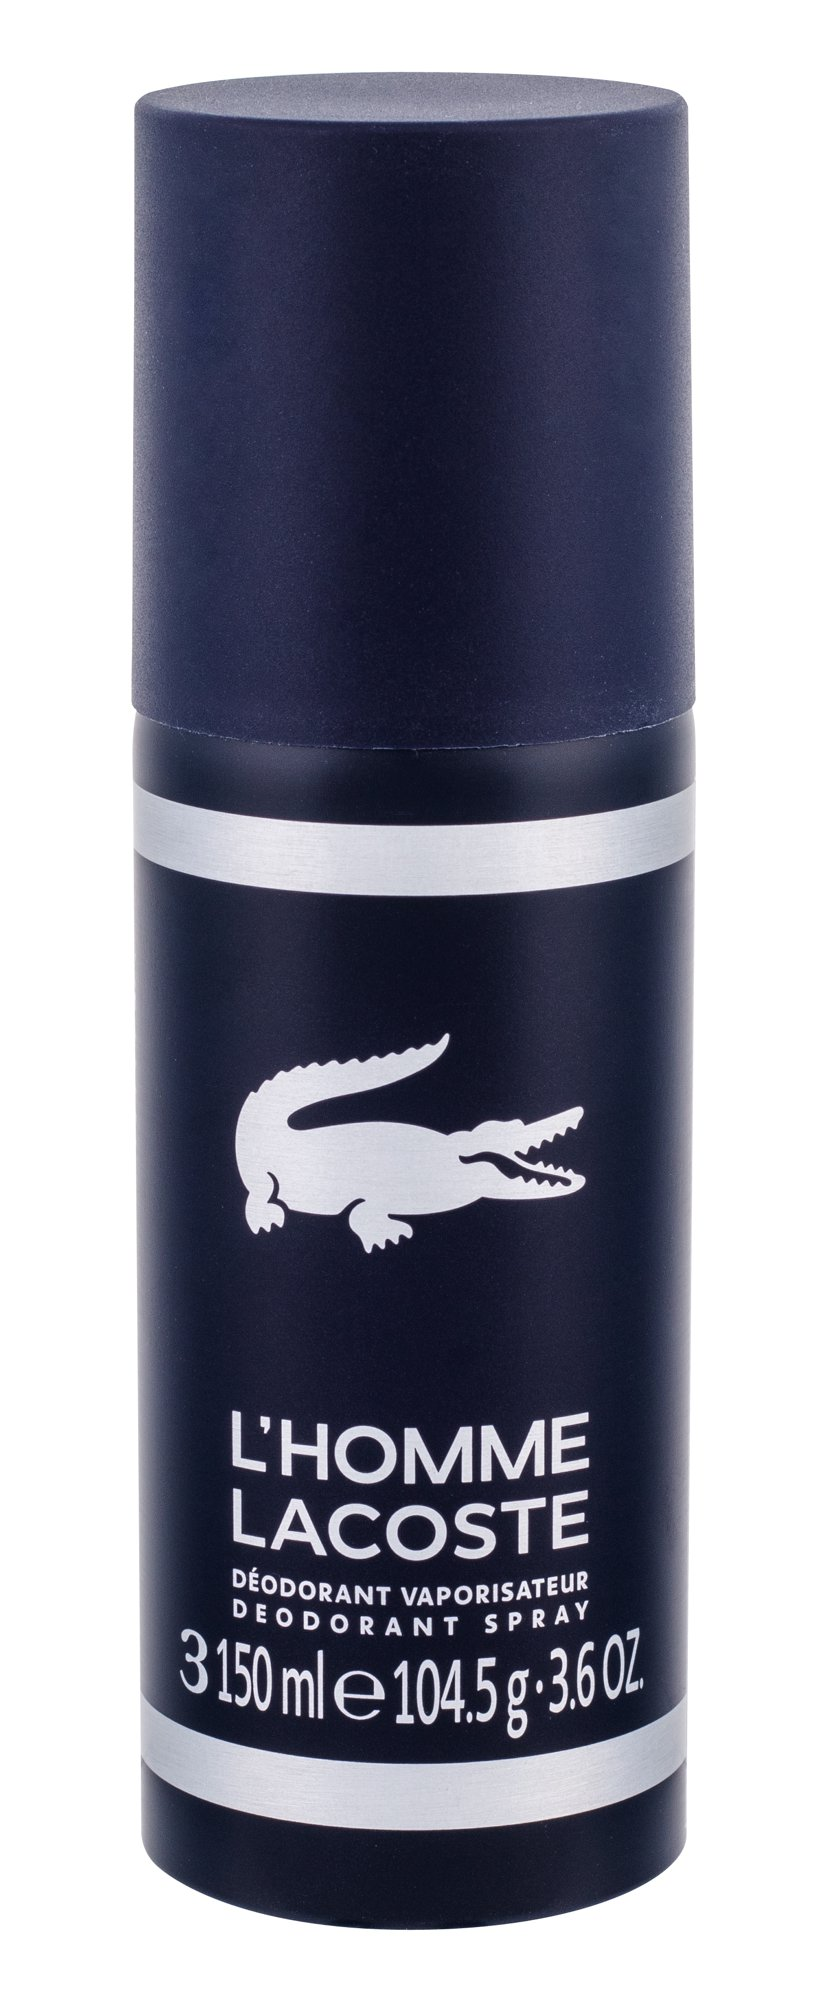 Lacoste L´Homme Lacoste, Deodorant 150ml